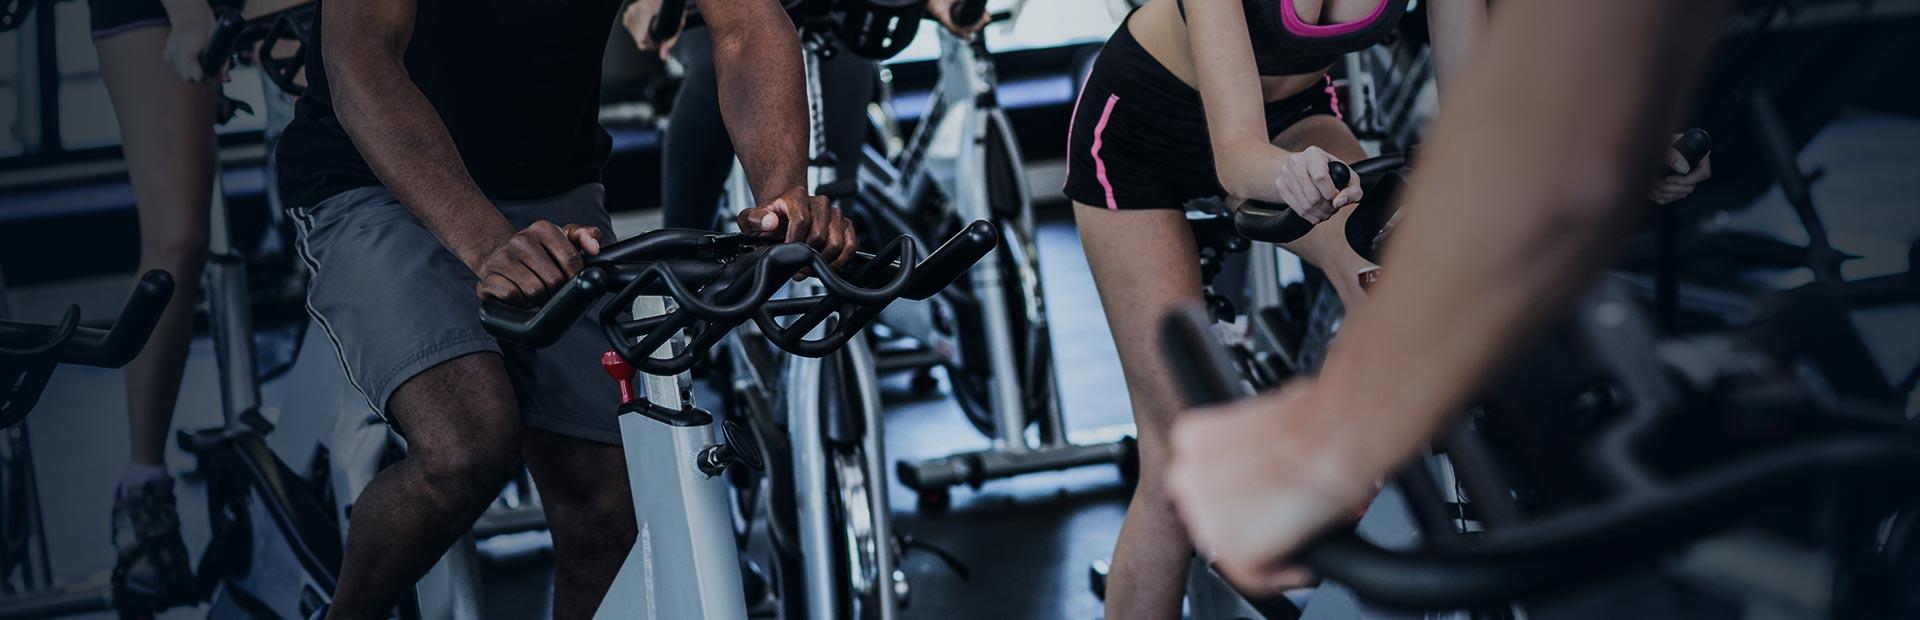 cycling-banner-img.jpg